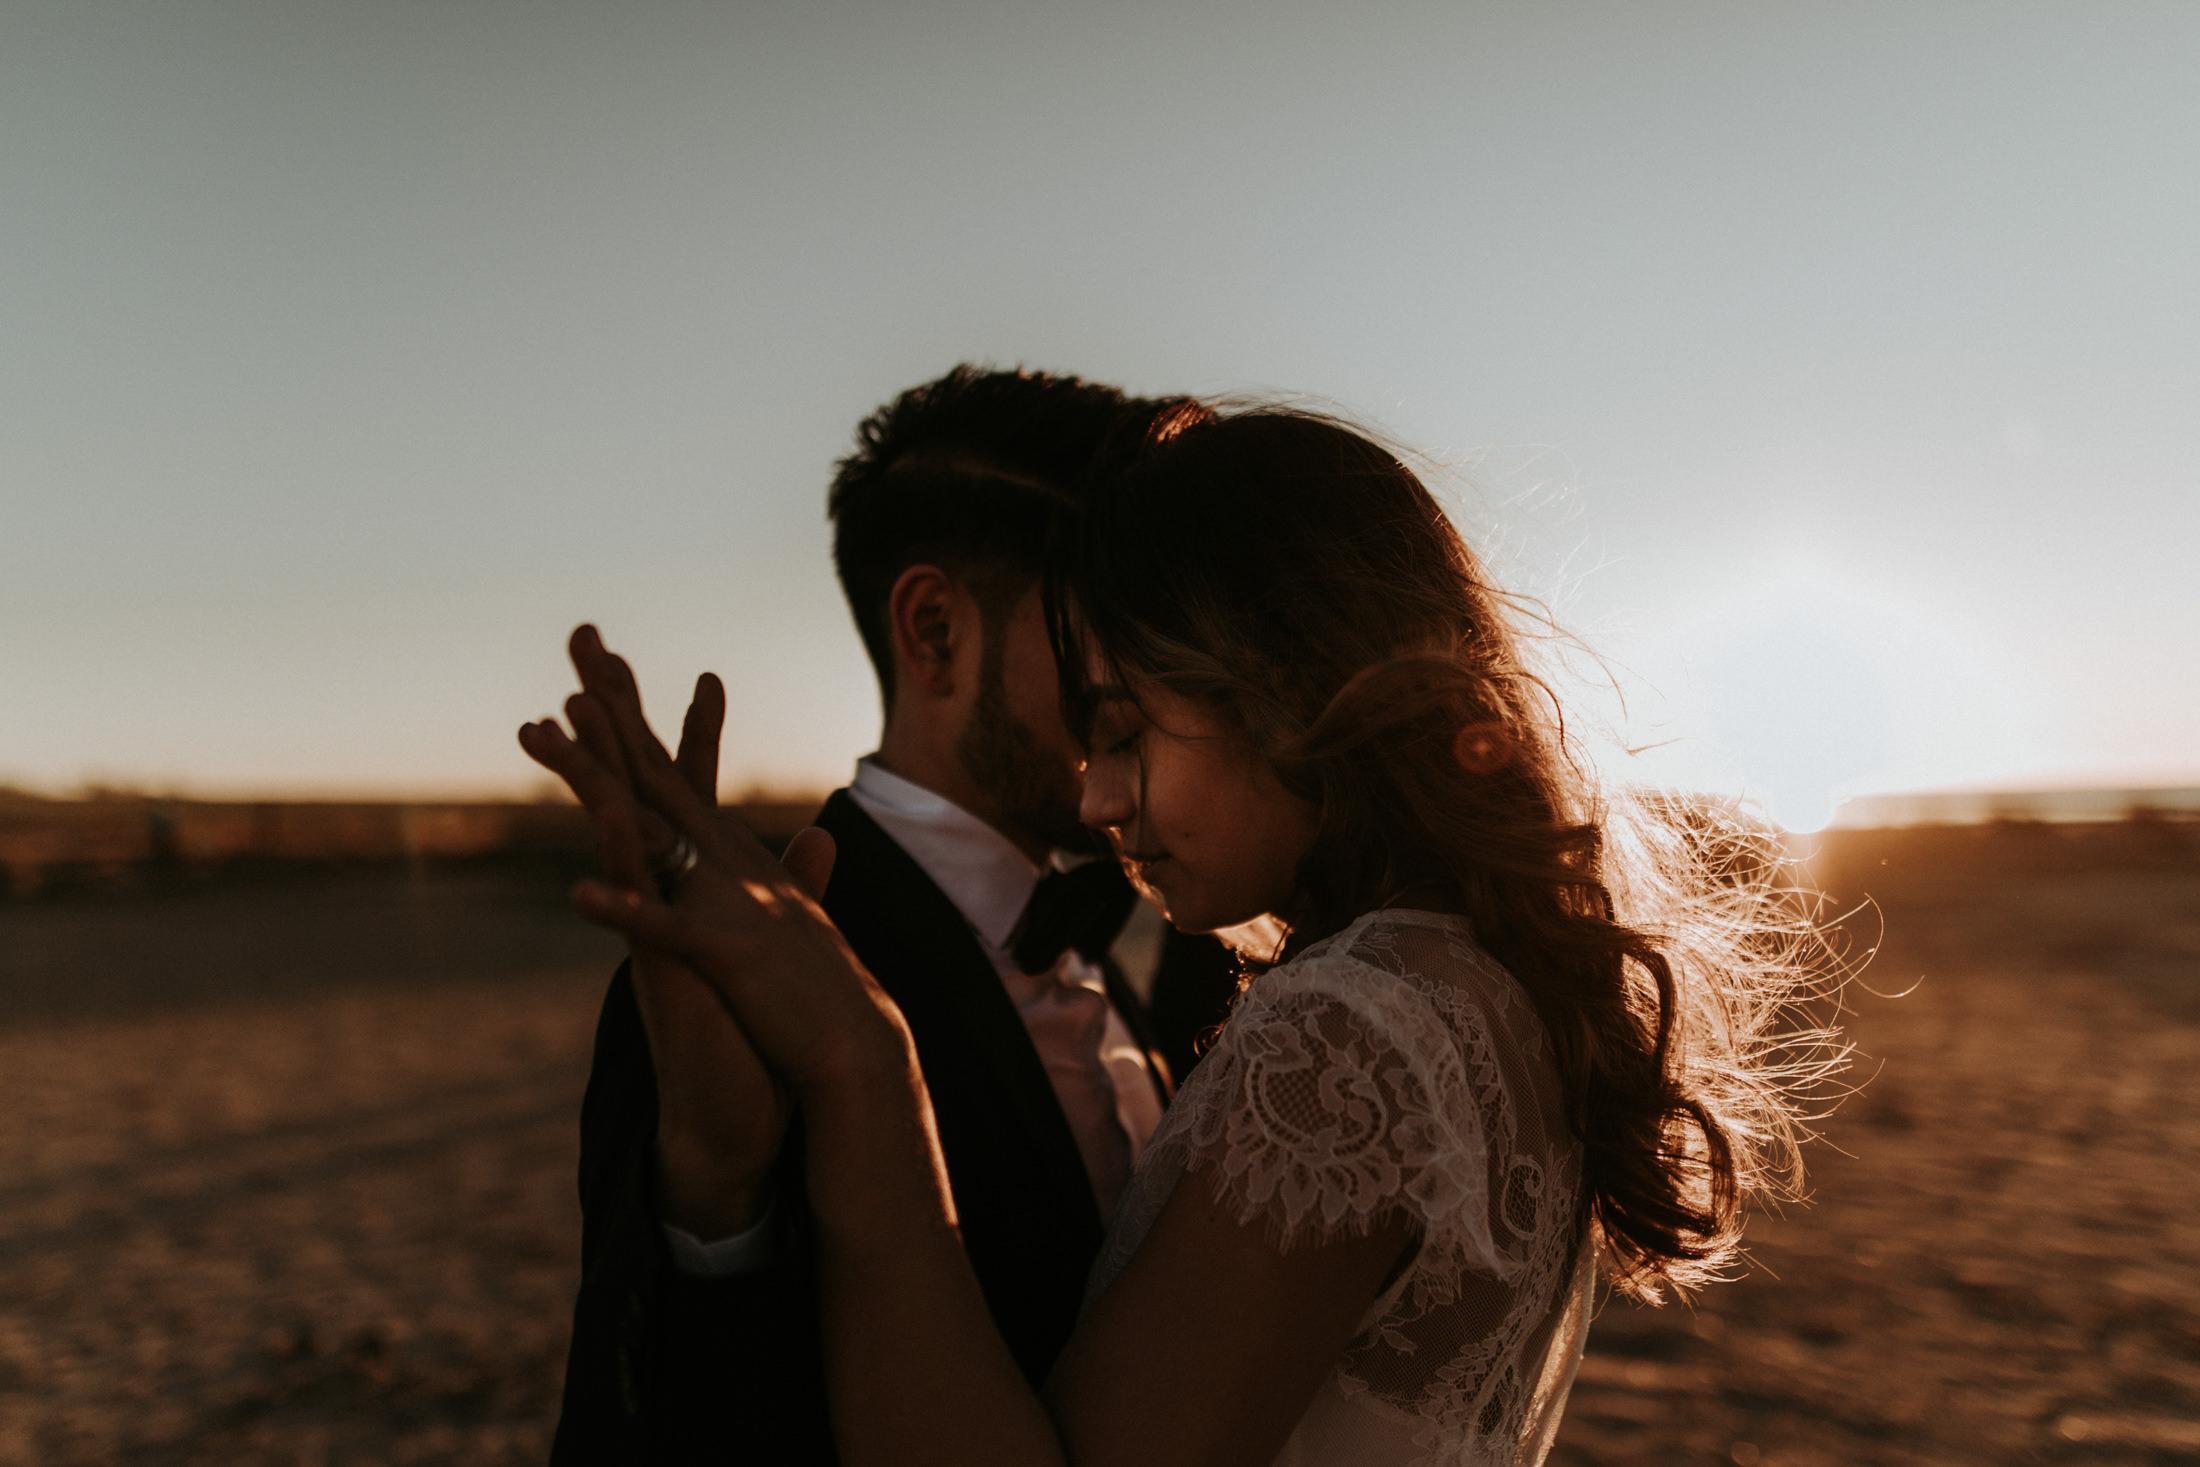 Wedding_Photographer_Mallorca_Daniela-Marquardt_Photography_CanaryIslands_Lanzarote_Iceland_Tuskany_Santorini_Portugal_Schweiz_Austria_Bayern_Elopement_Hochzeitsfotograf_Norddeichich_70